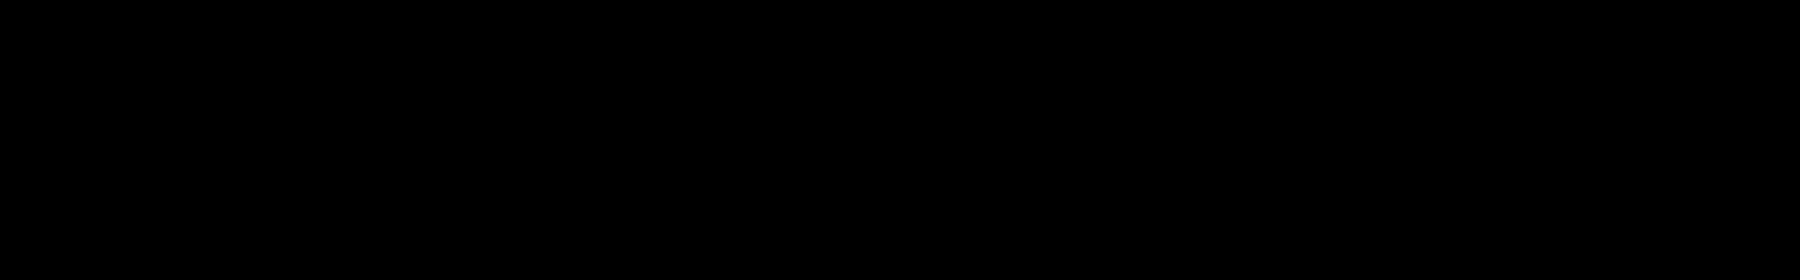 JAVI DEL VALLE -TECH GROOVE VOL.2 audio waveform